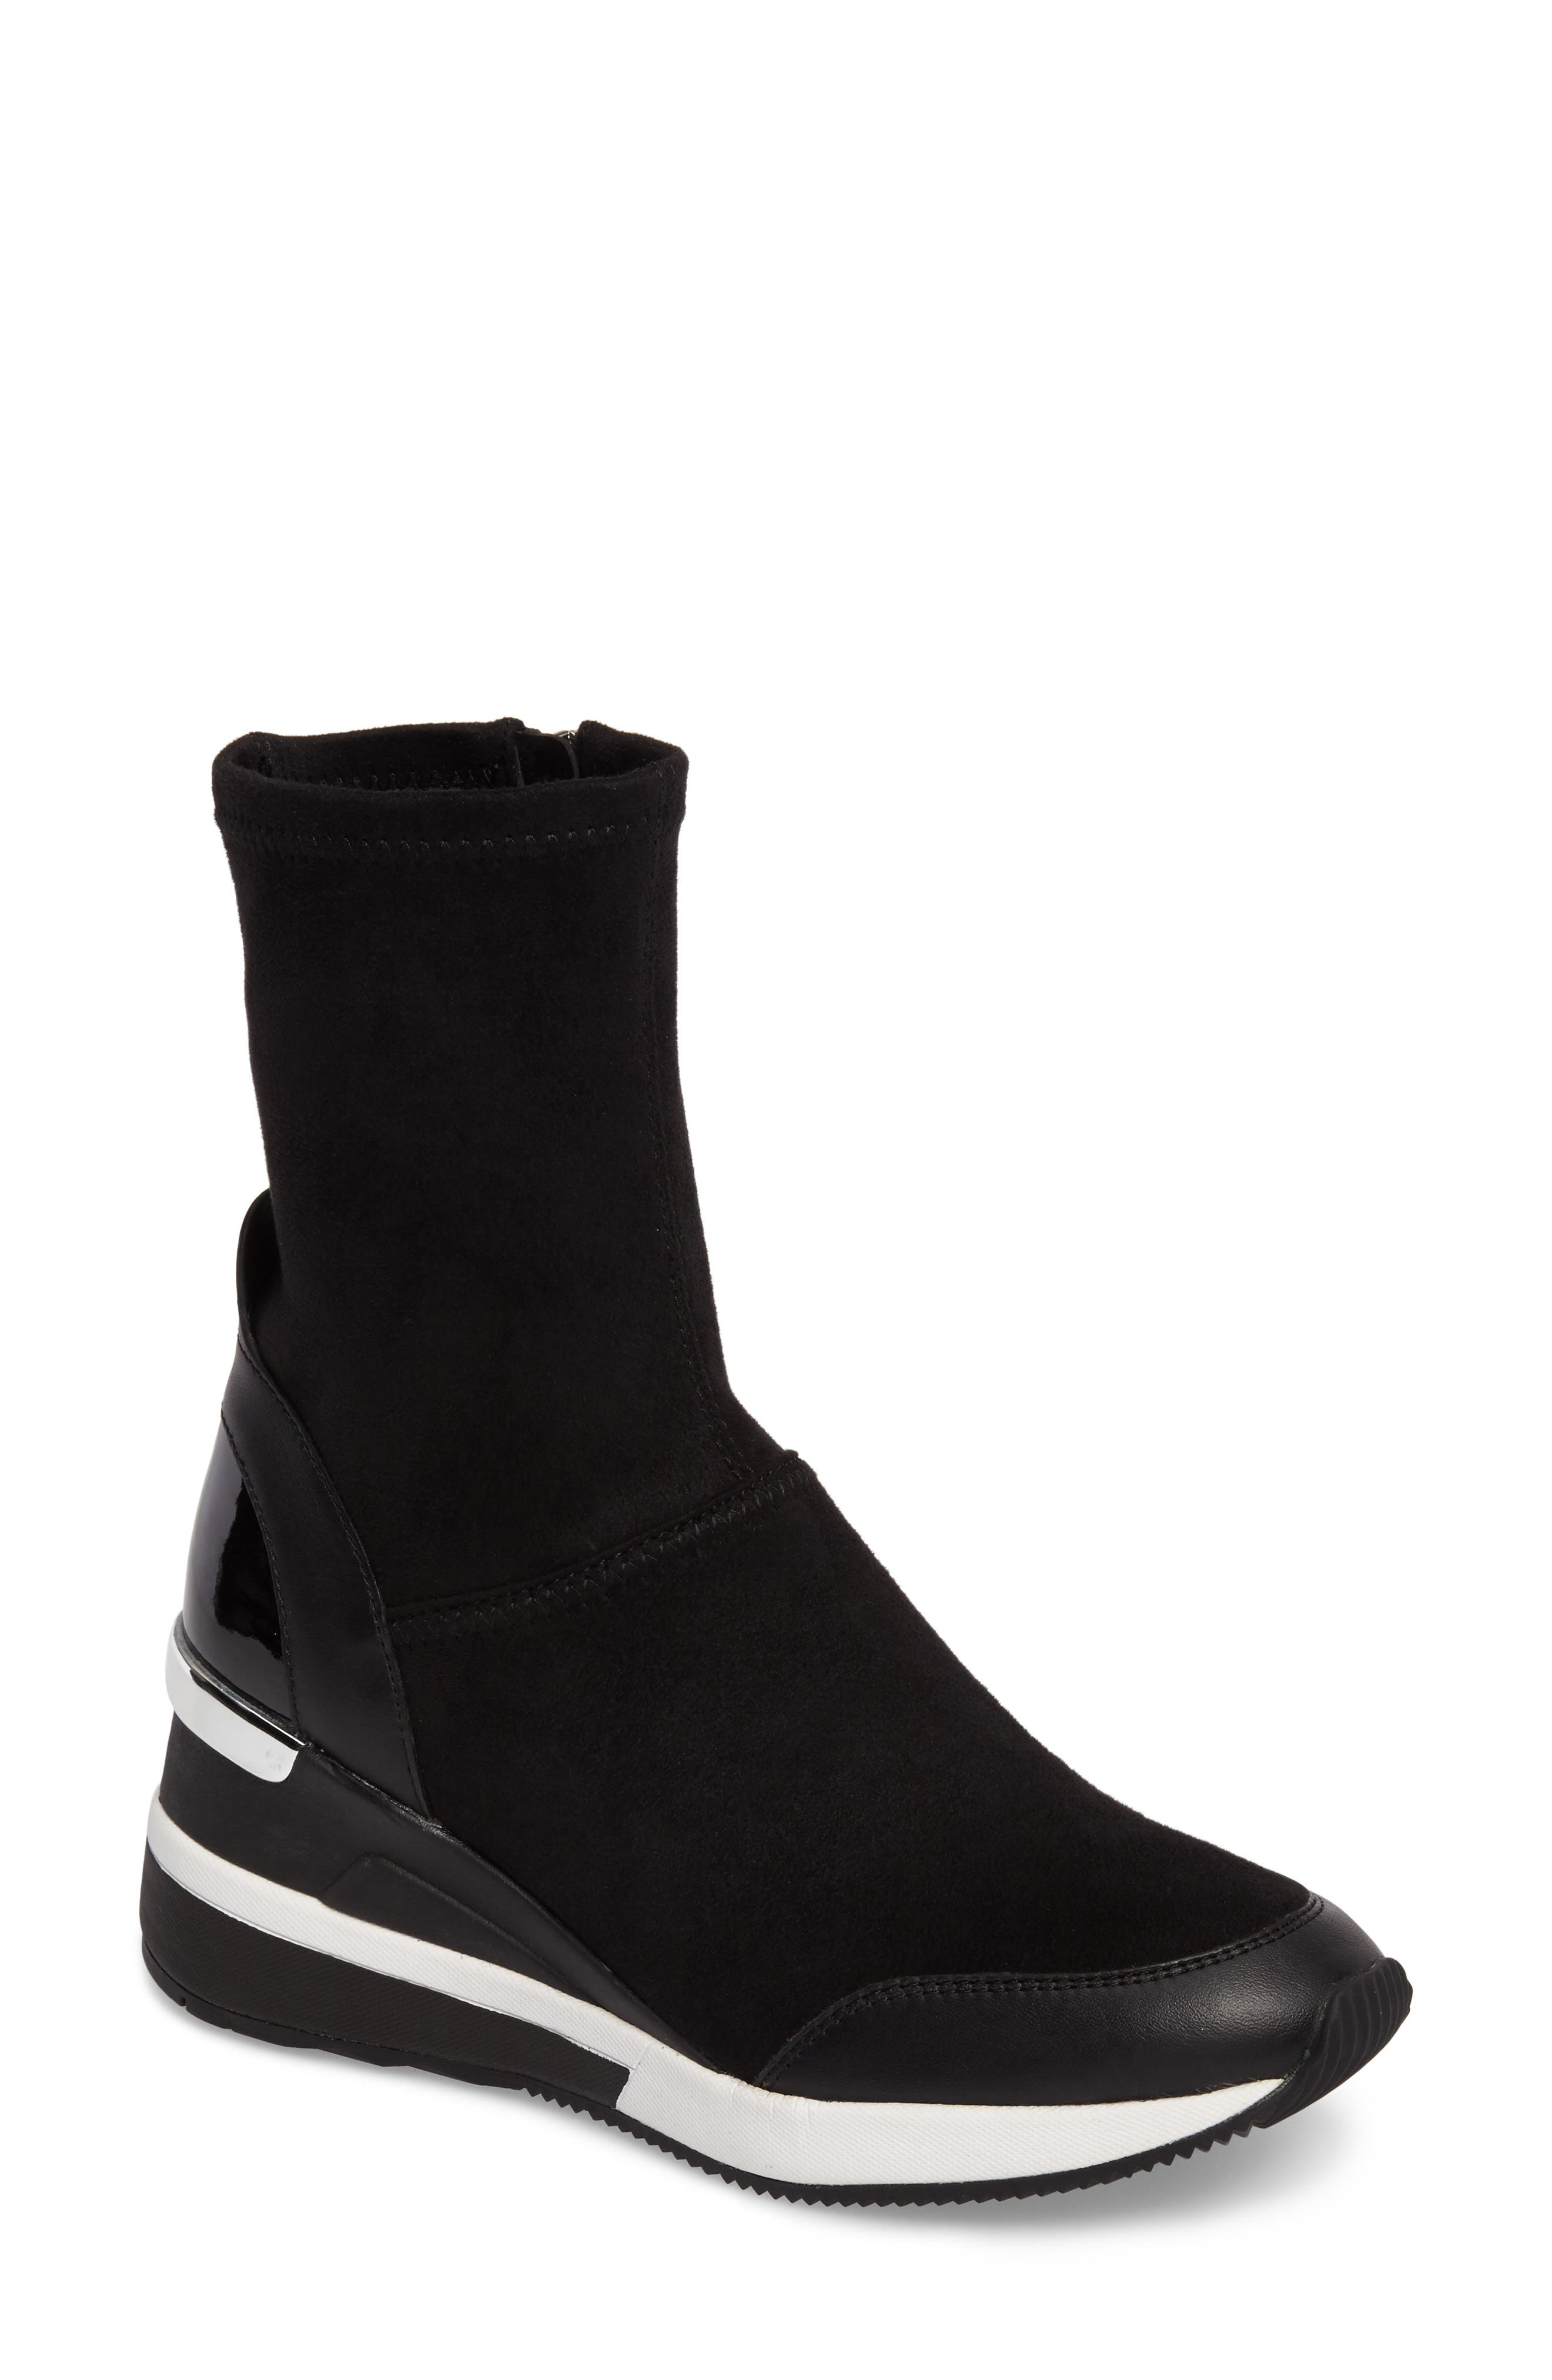 'Ace' Wedge Sneaker Bootie,                         Main,                         color, BLACK SUEDE